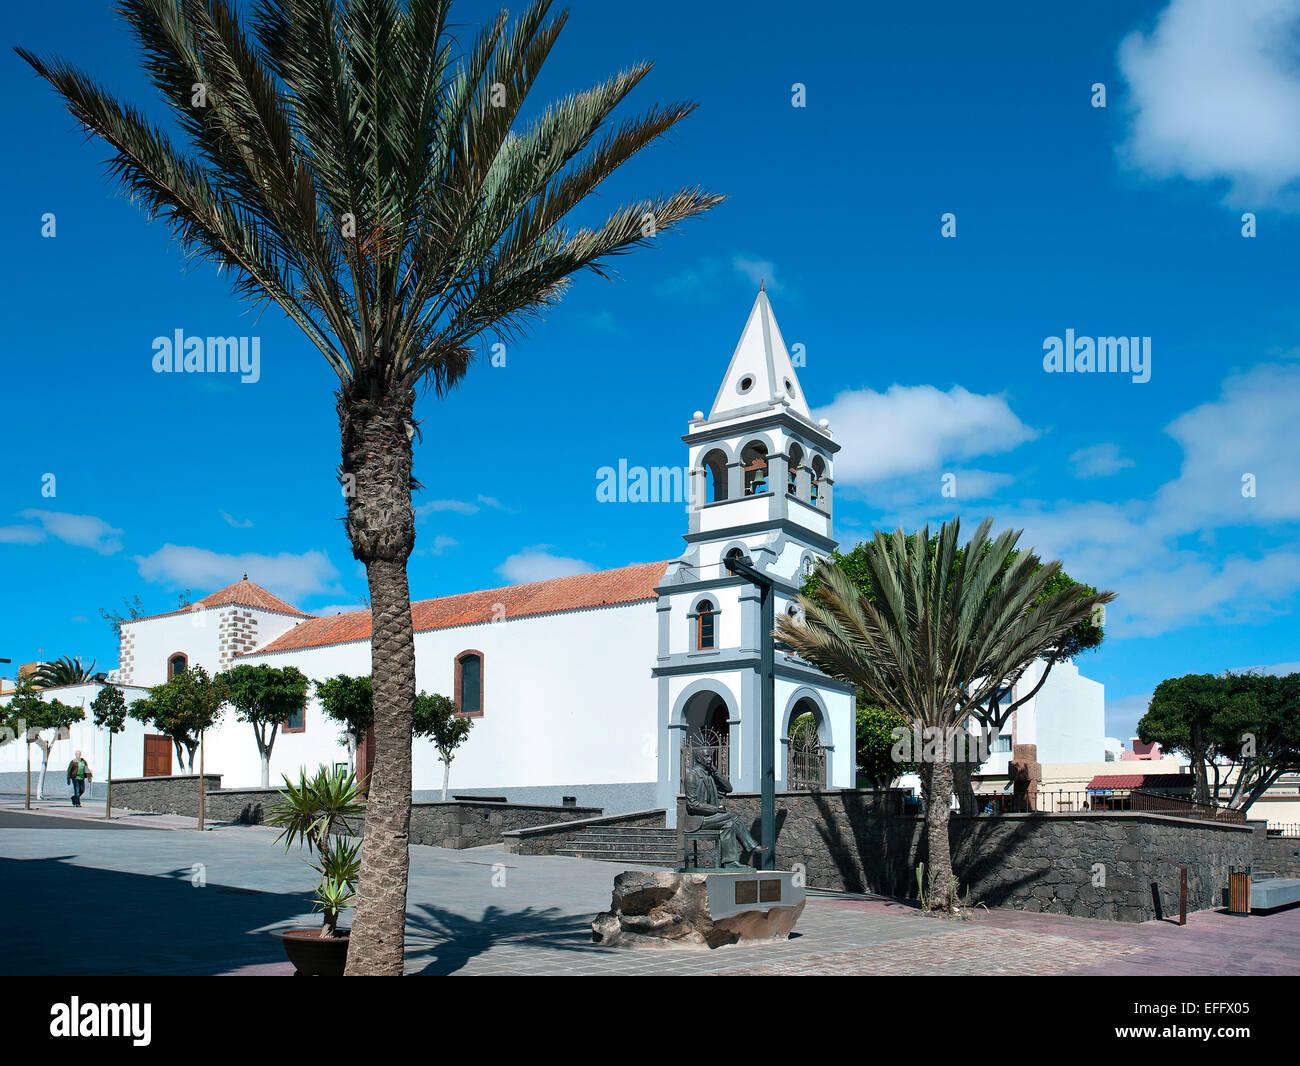 Kirche, Puerto del Rosario, Fuerteventura, Kanarische Inseln, Spanien Stockbild